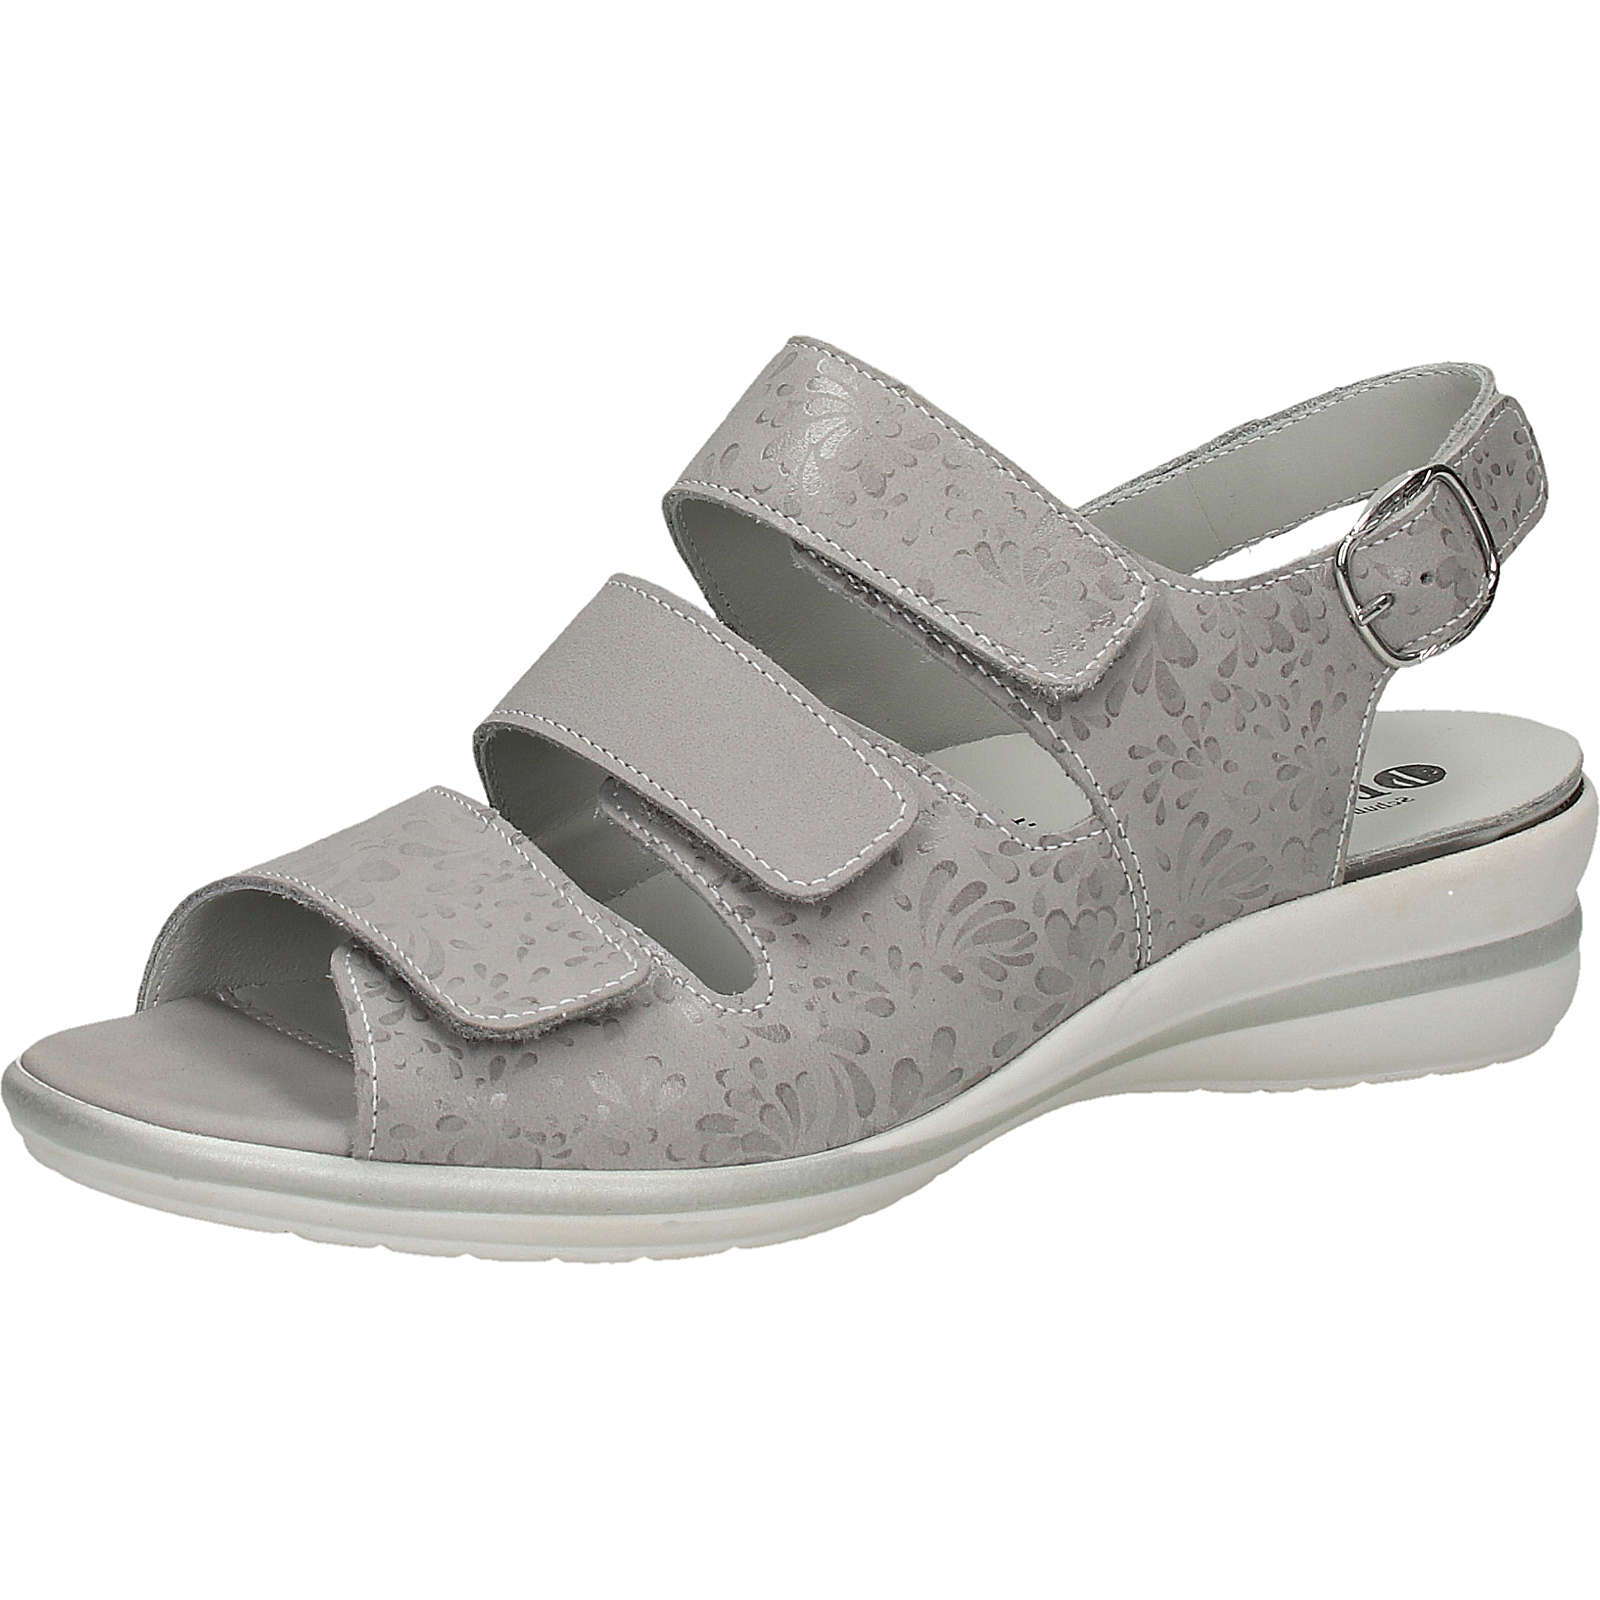 bama Sandalen Klassische Sandalen grau Damen Gr. 41